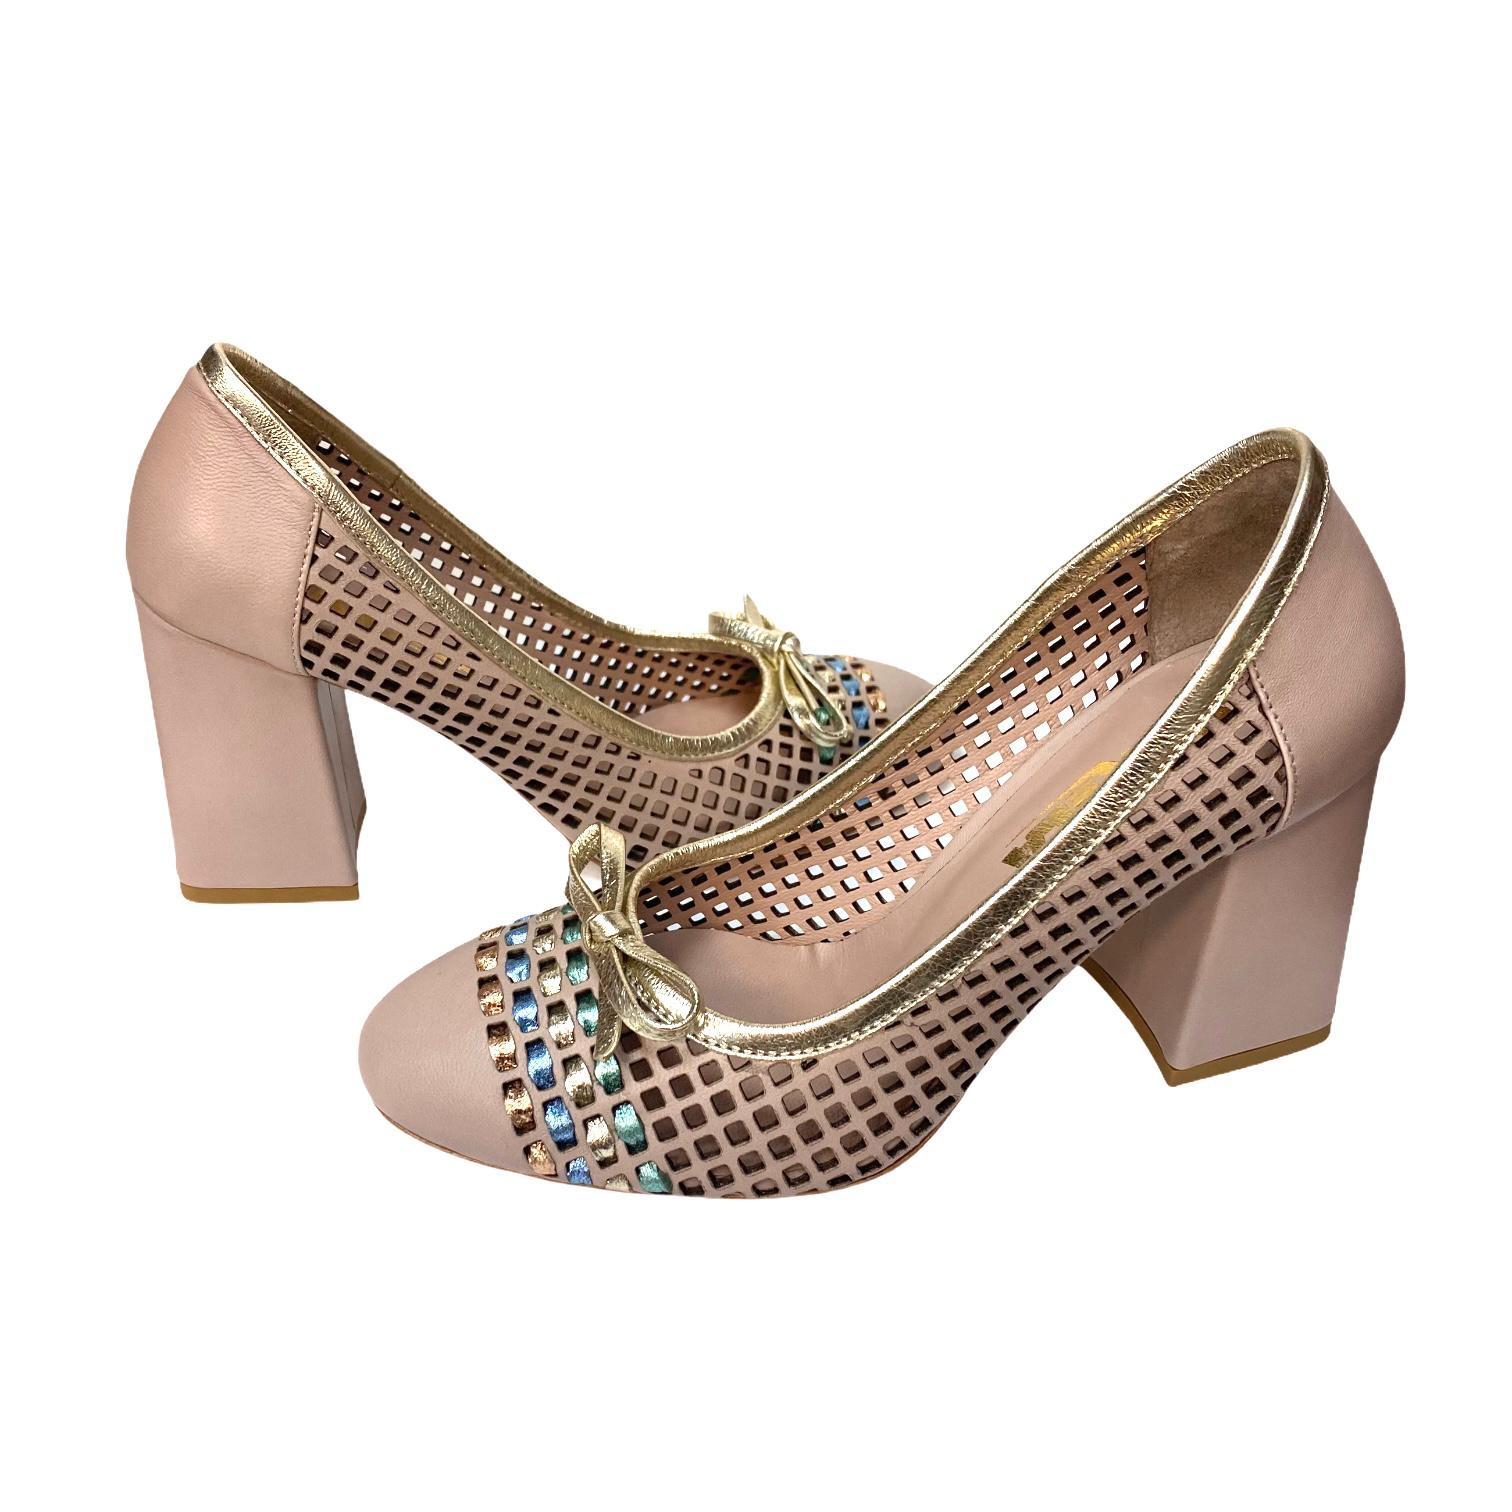 Pantofi nude cu fundita si detaliu